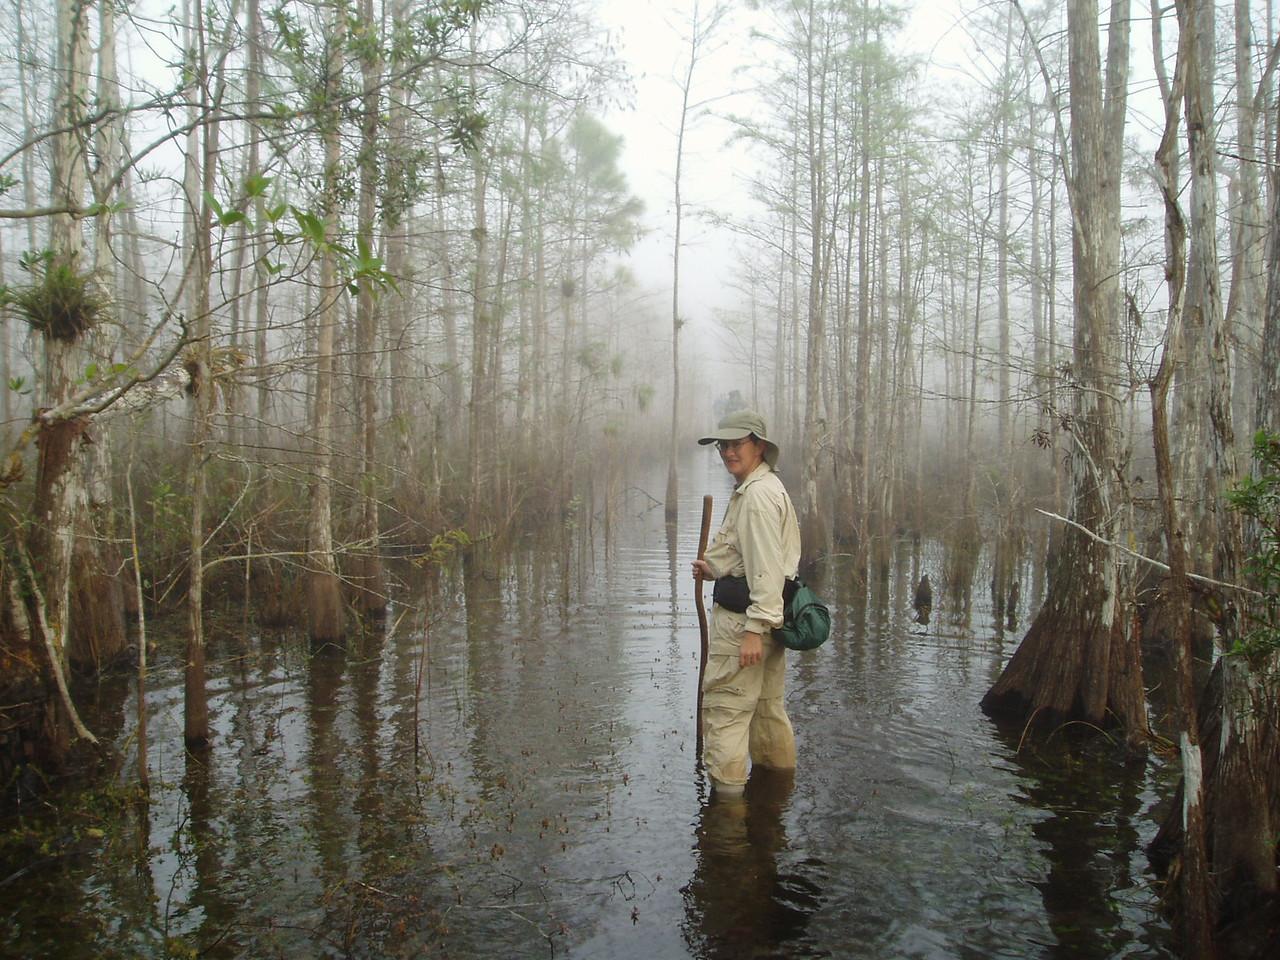 Shortcut takes a hike<br /> PHOTO CREDIT: Robert Coveney / Florida Trail Association